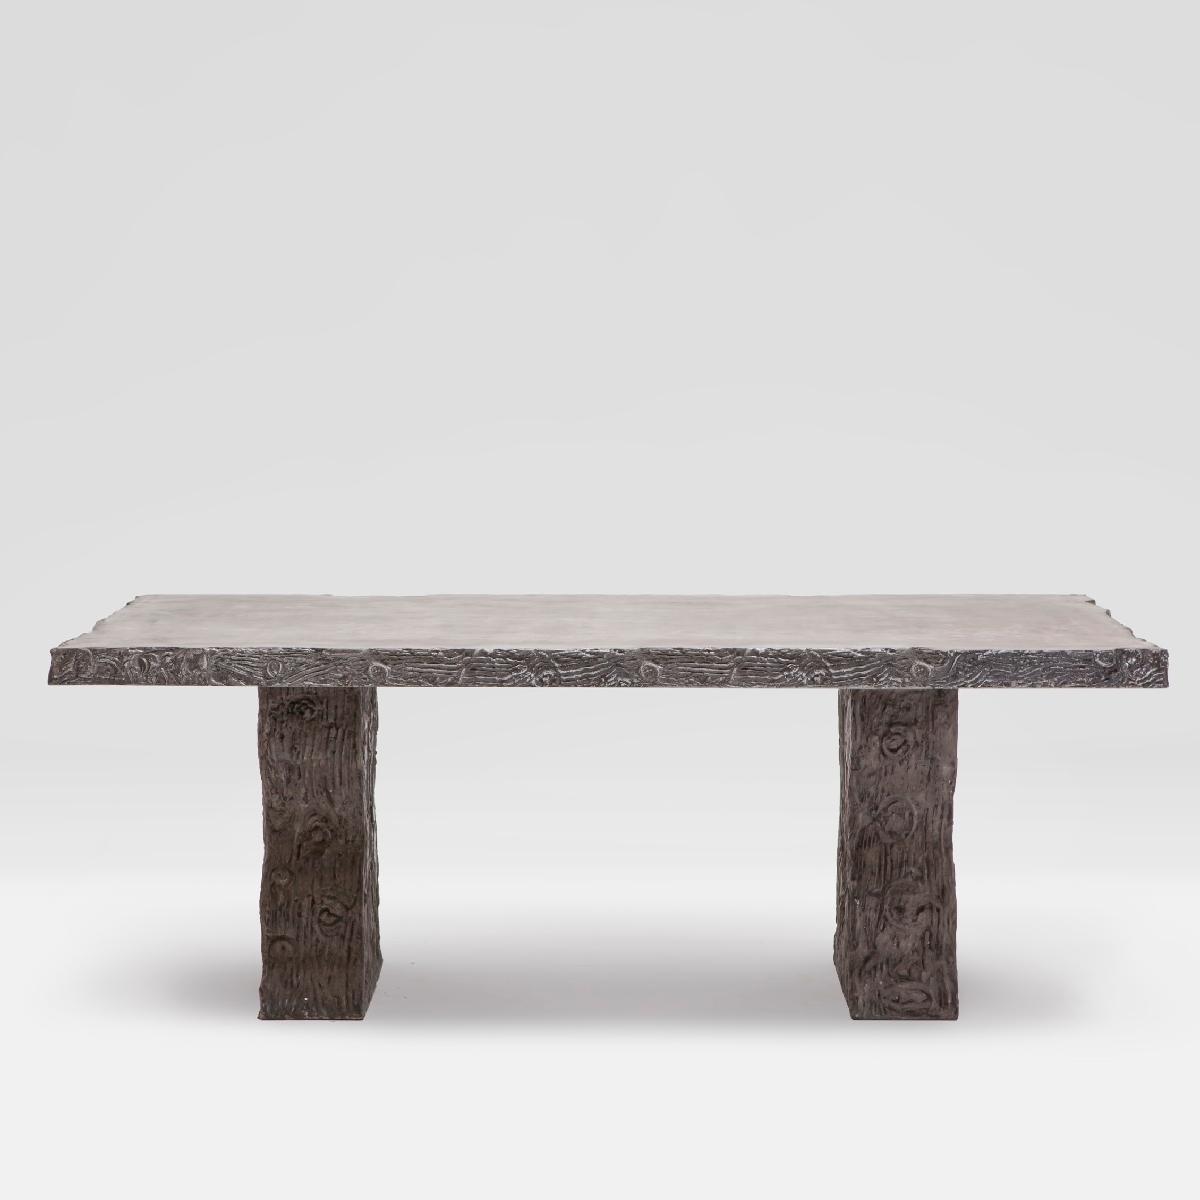 concrete outdoor dining table. Faux Bois Outdoor Concrete Dining Table U